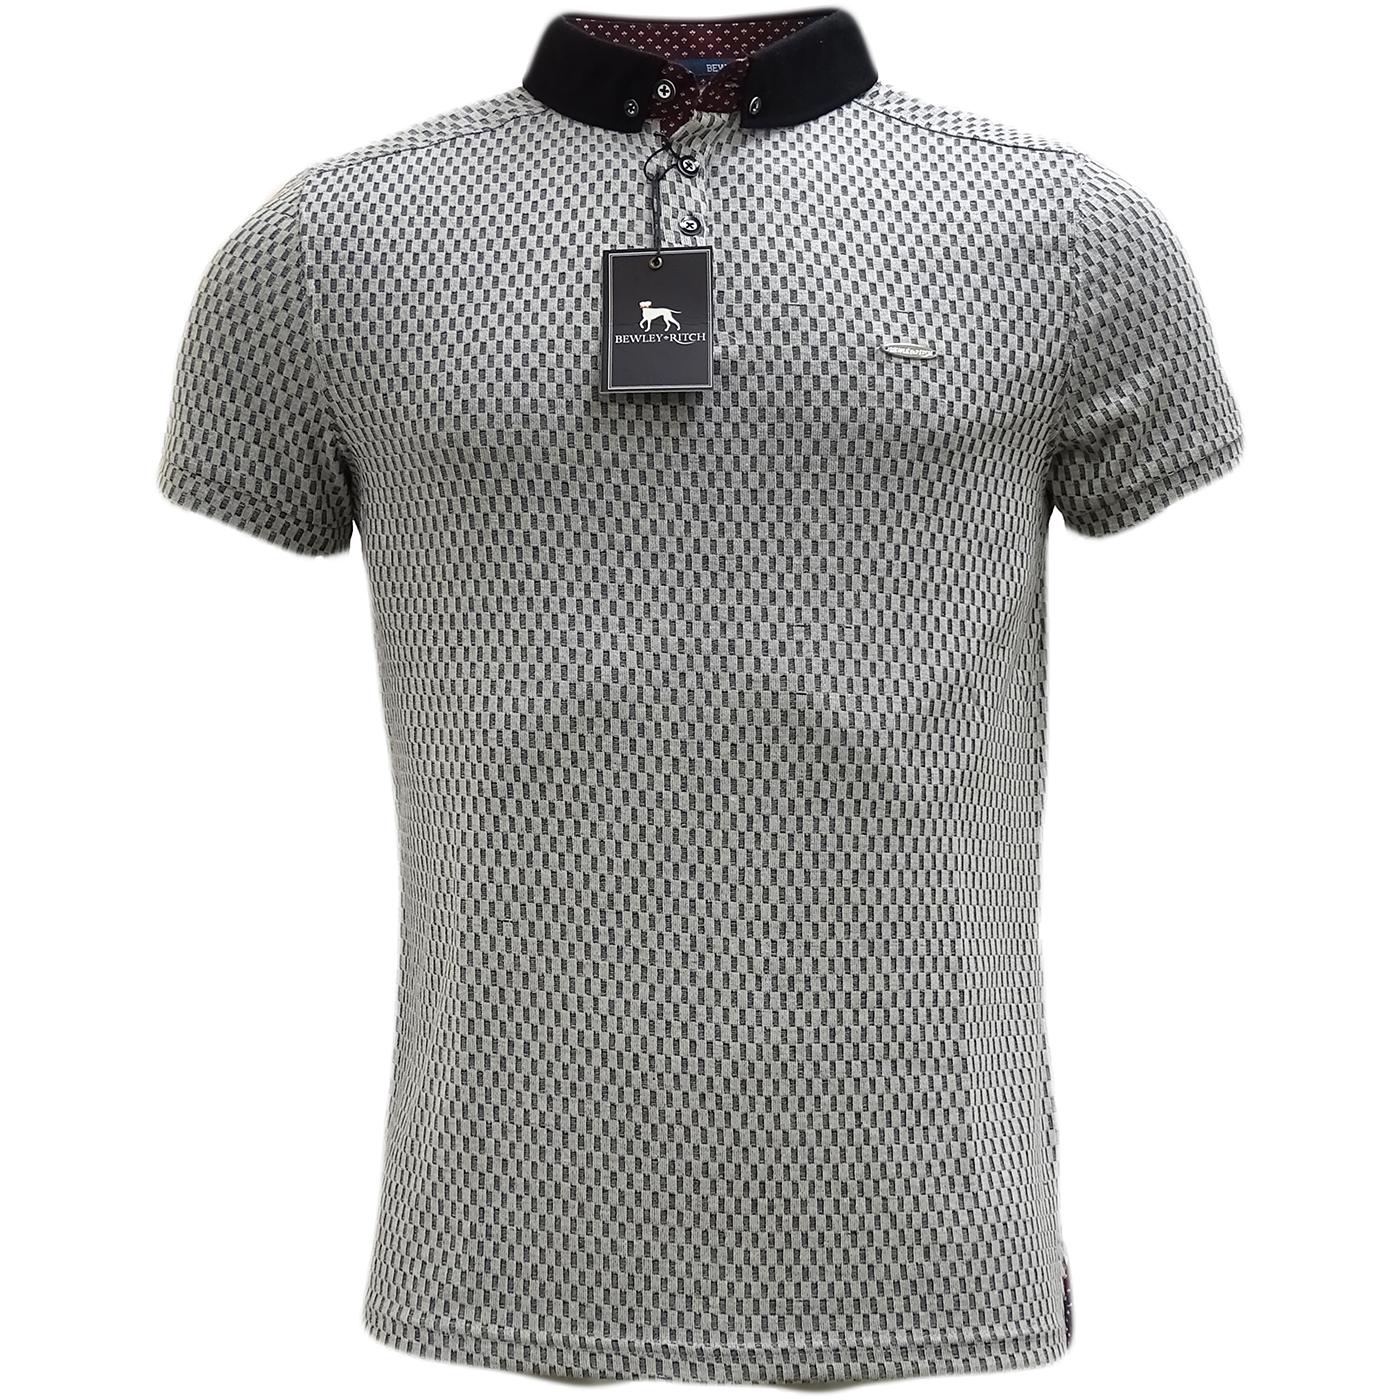 Bewley & Ritch Grey Lightweight Polo Shirt